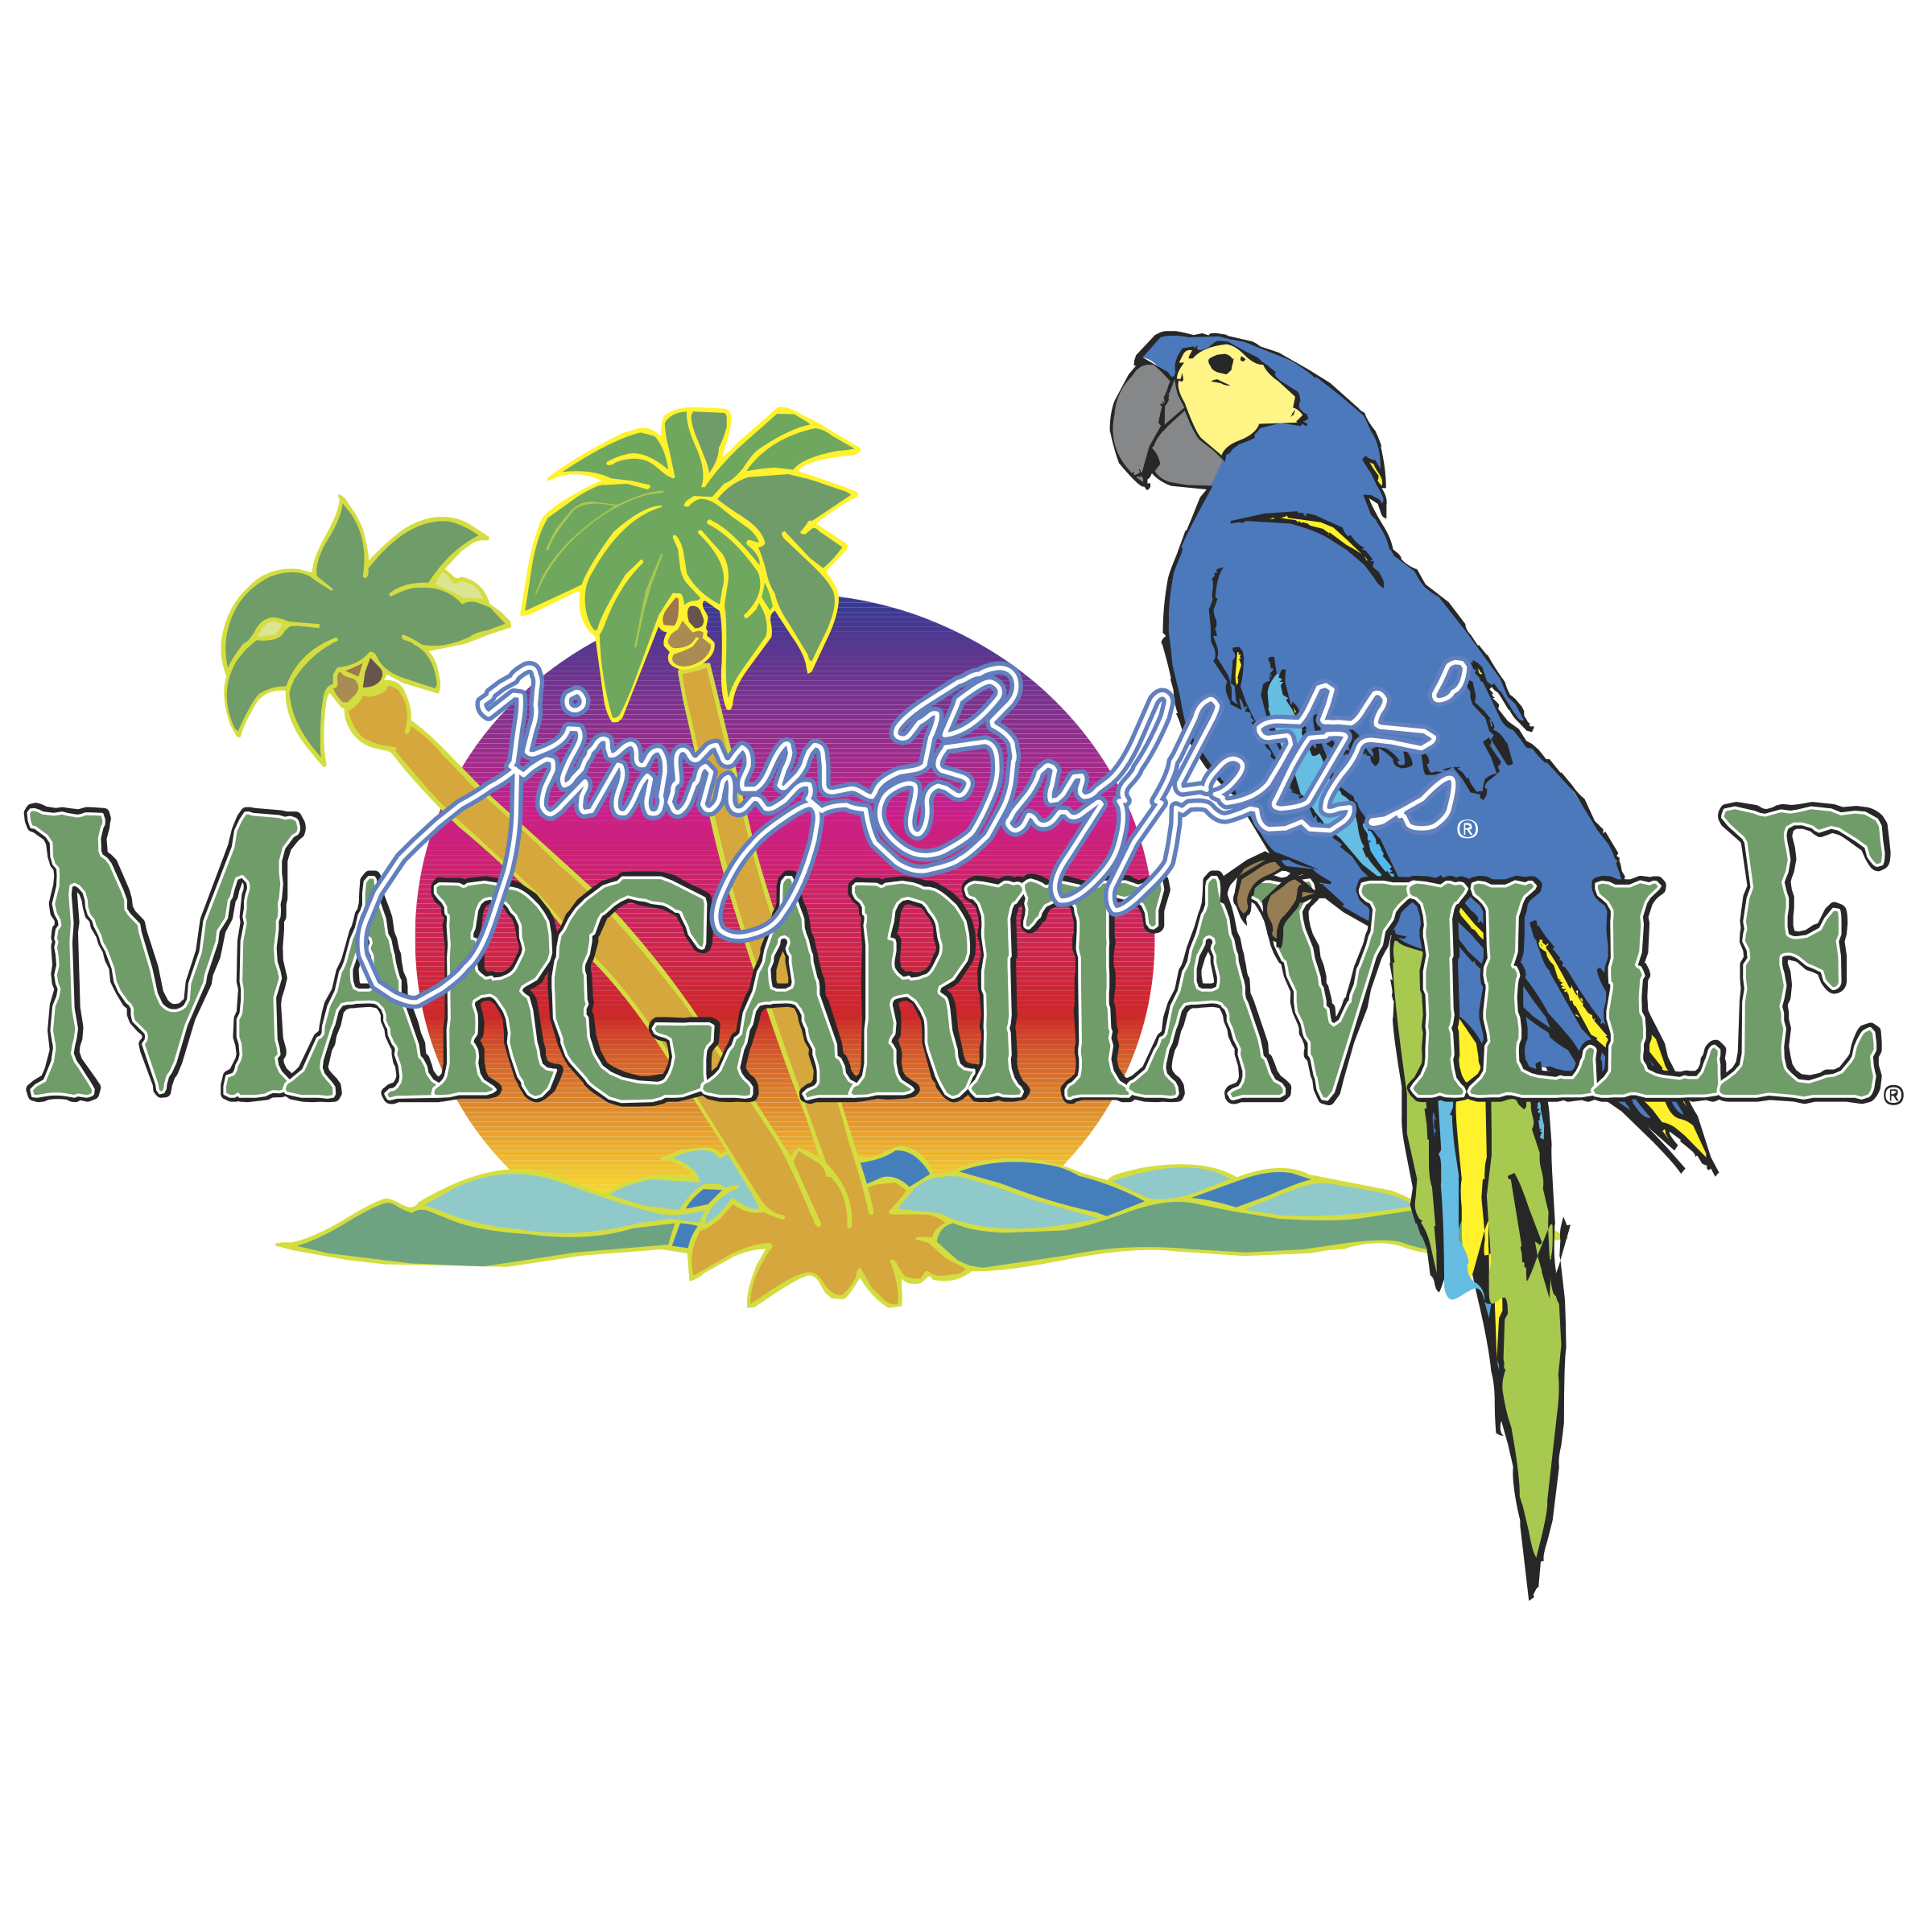 margaritaville-jimmy-buffetts-logo-png-t